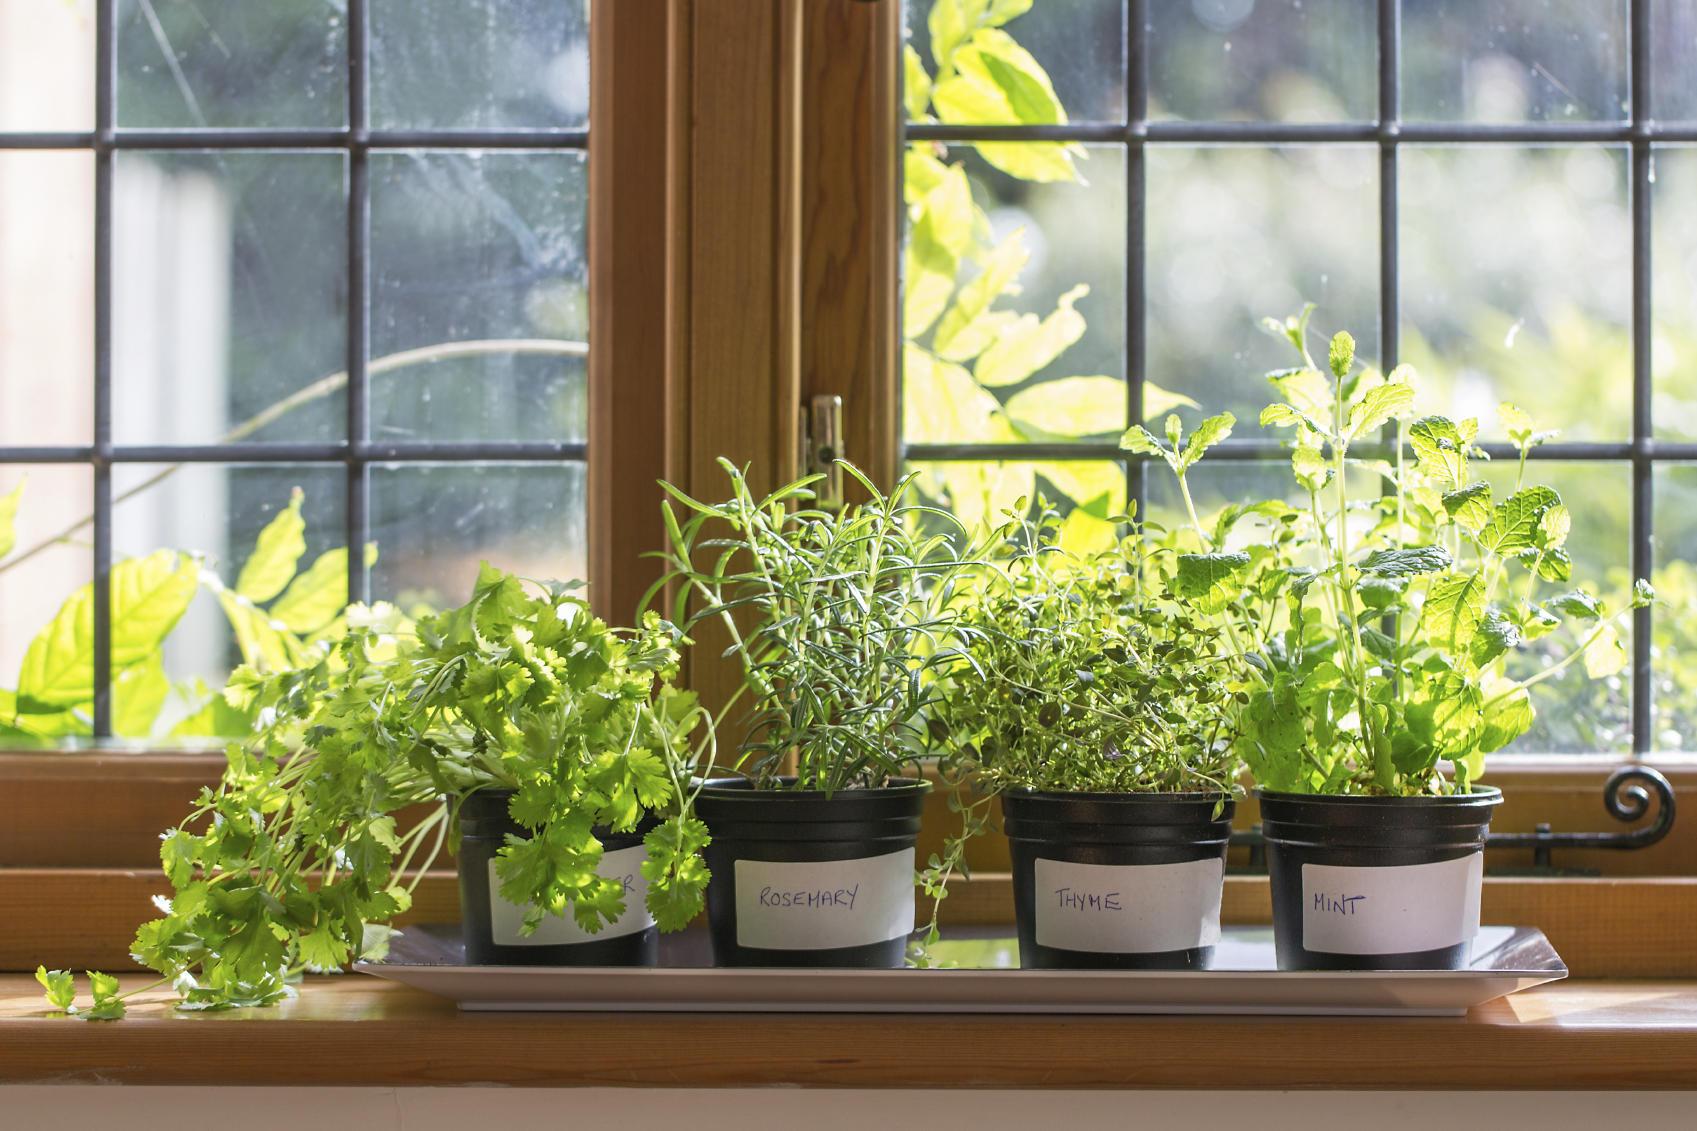 grocery-store-money-saving-herbs